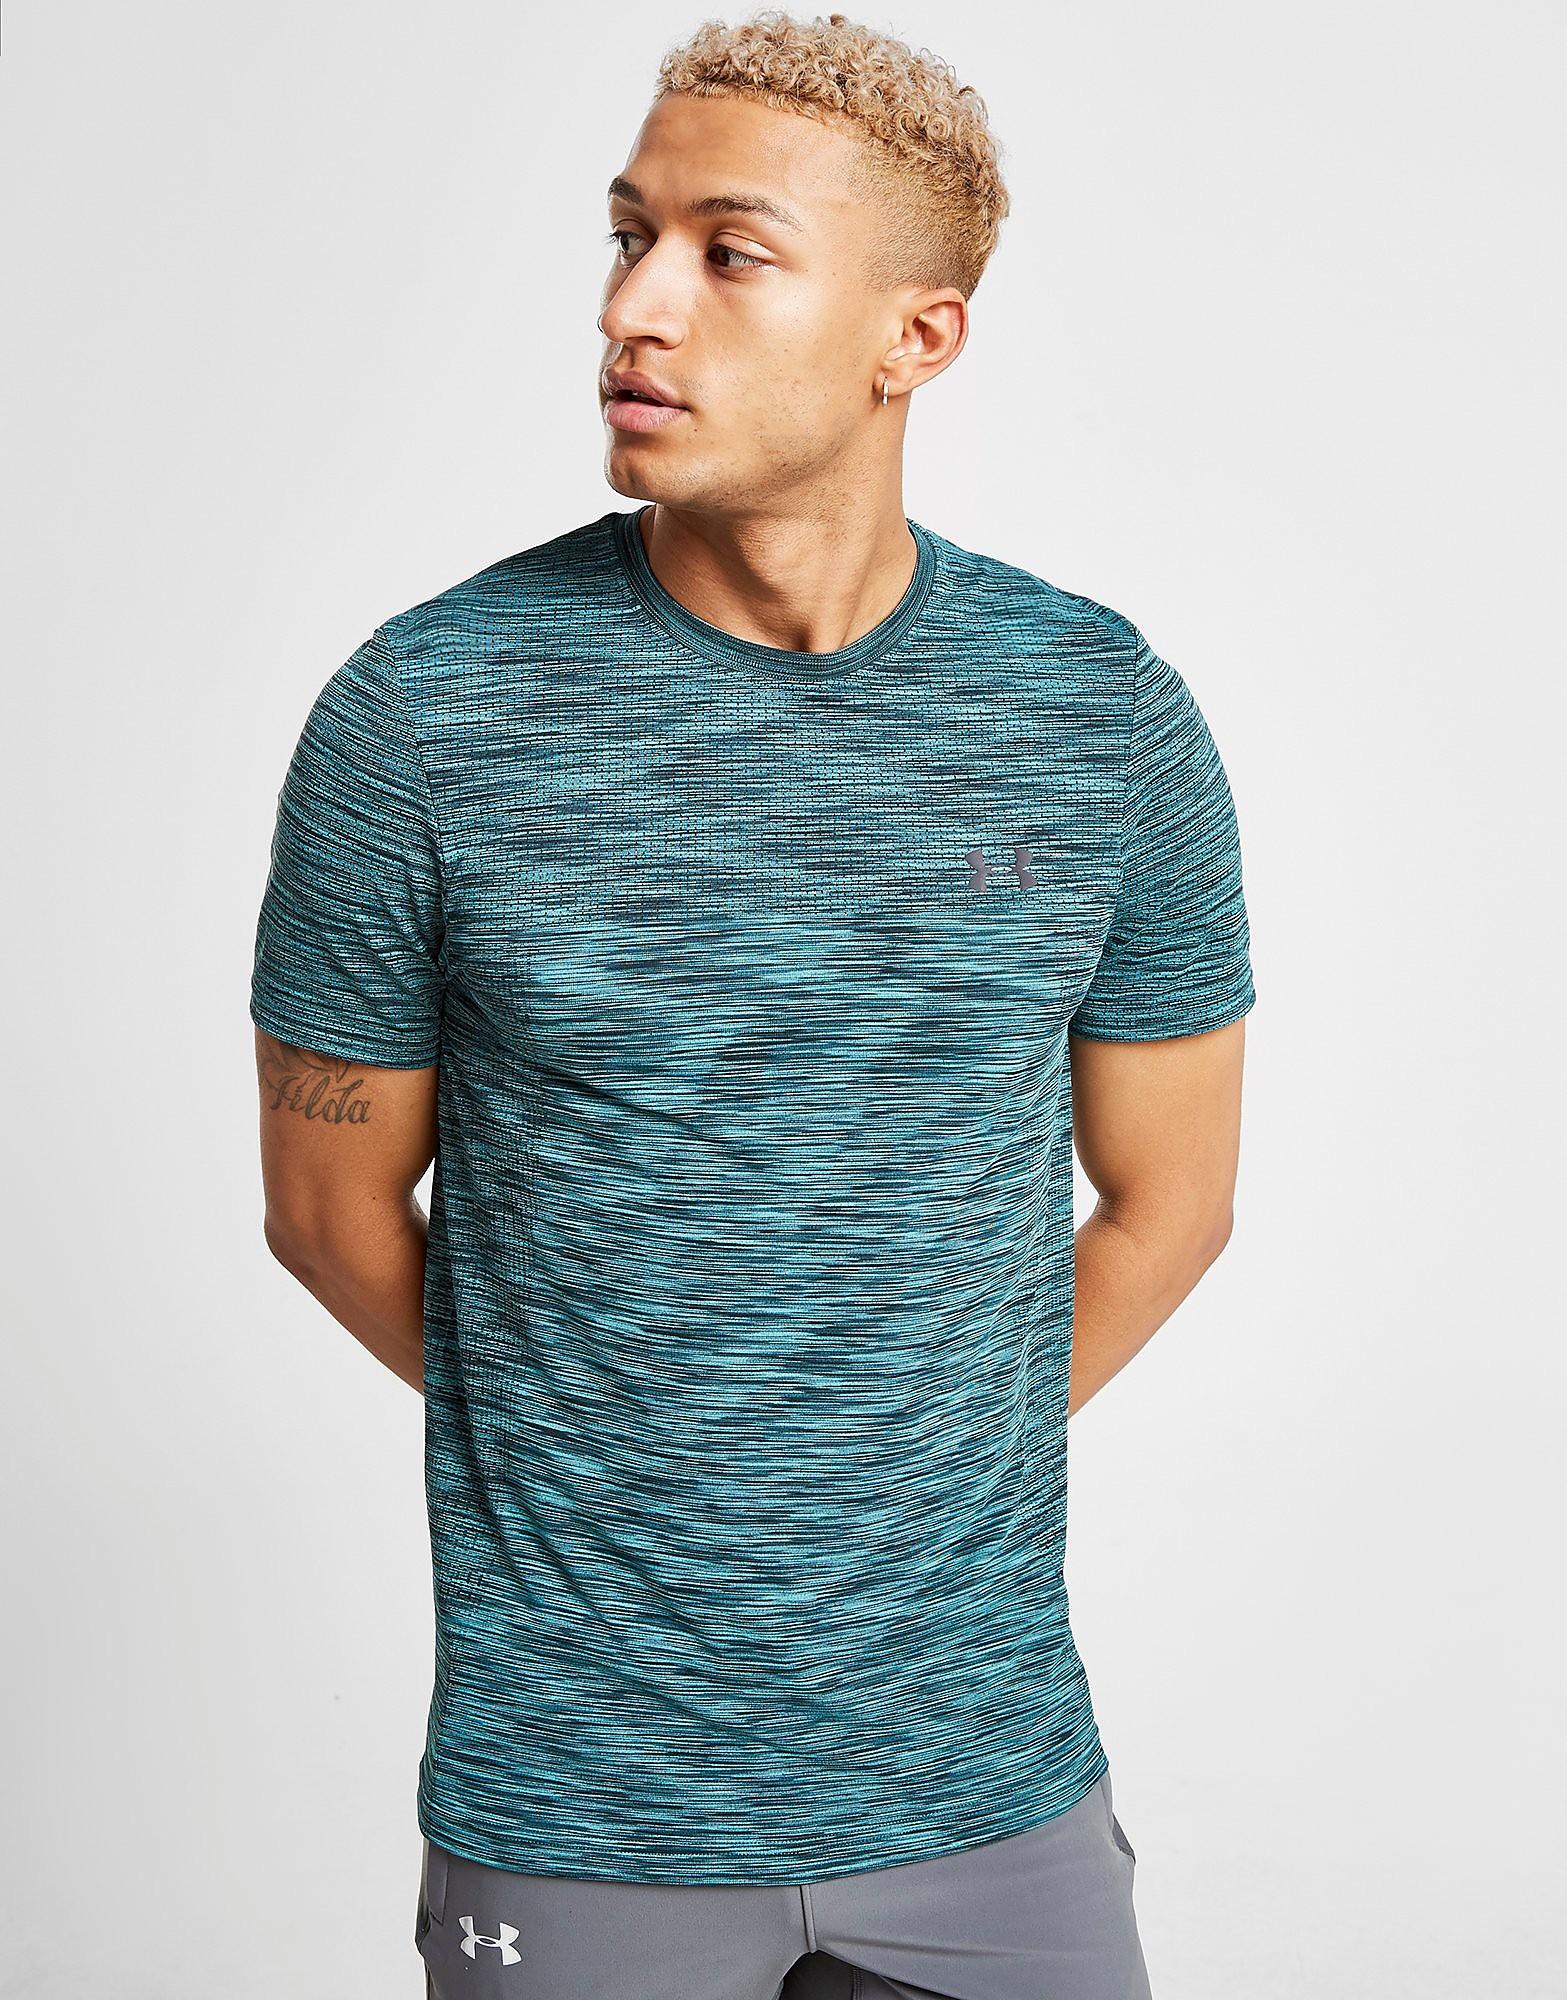 Under Armour Vanish Seamless Short Sleeve T-Shirt Heren - Groen - Heren